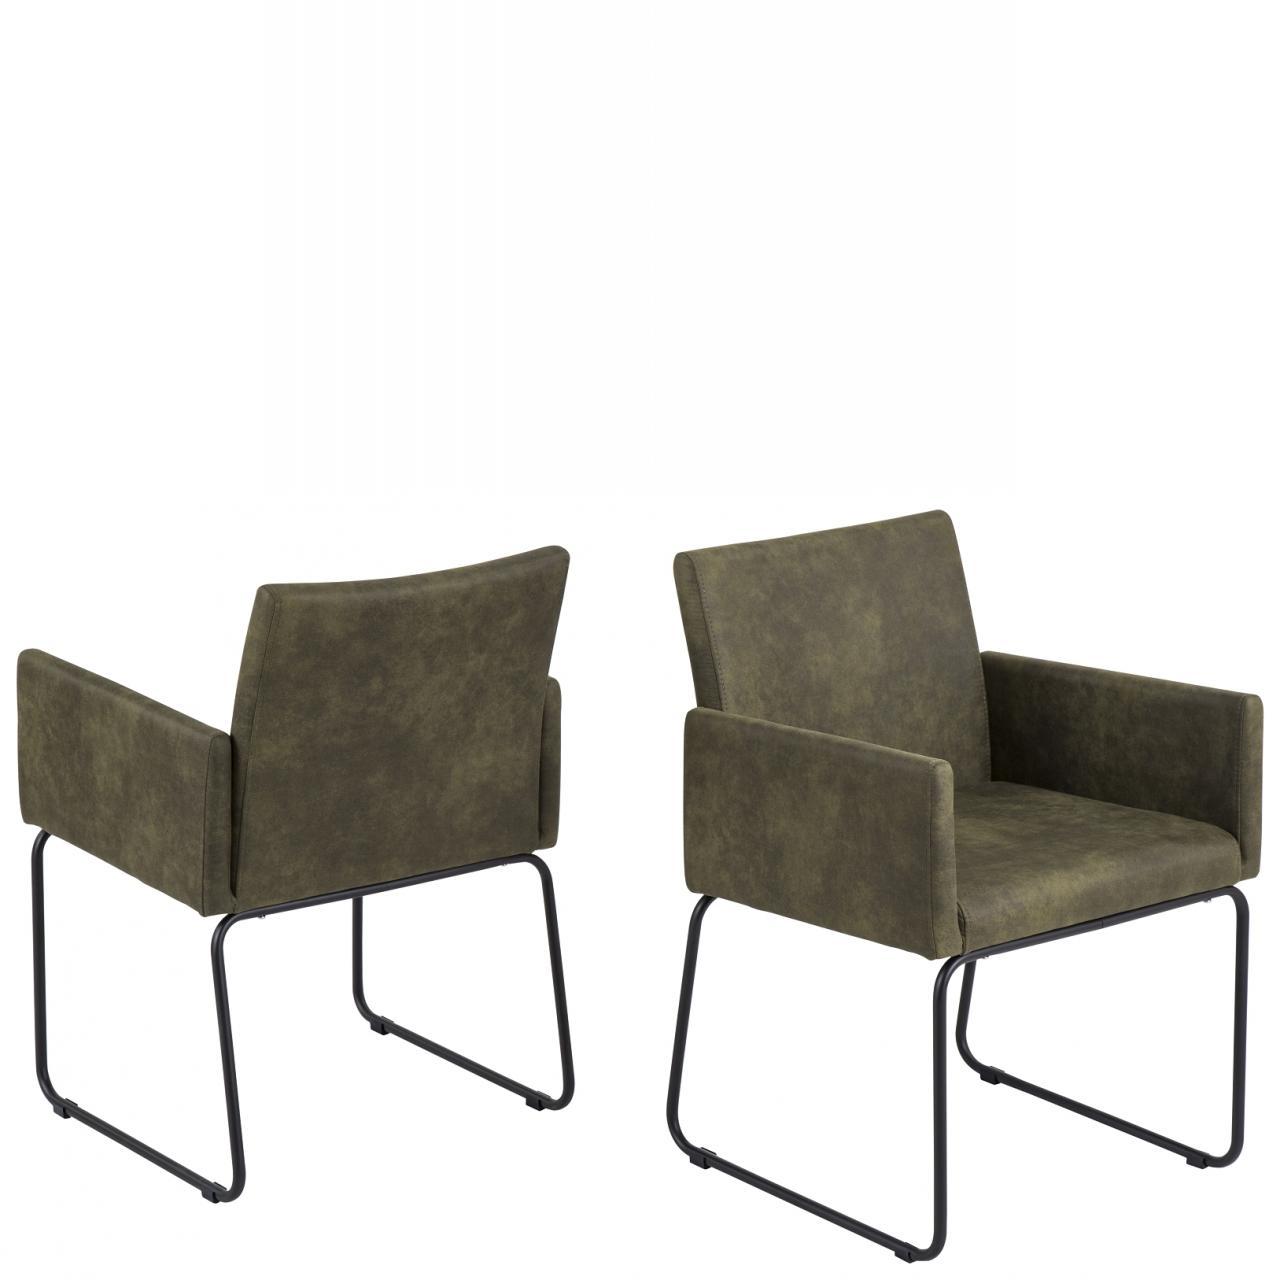 stuhl nils in dunkelgr n st hle hocker esszimmer wohnen m bel j hnichen center gmbh. Black Bedroom Furniture Sets. Home Design Ideas